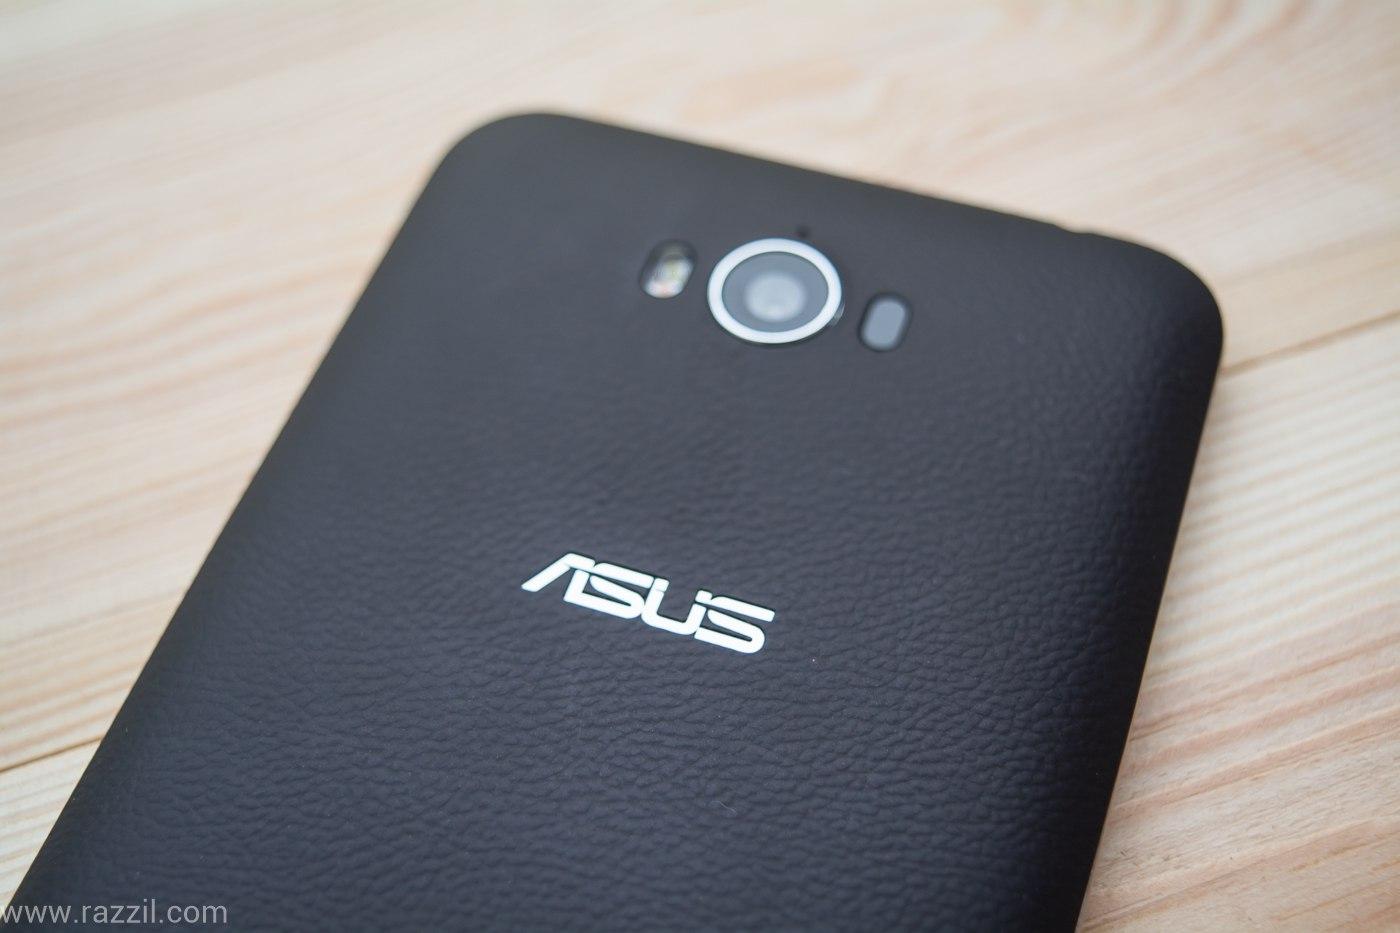 Asus Zenfone 2 Laser In-depth Review | Digital Conqueror